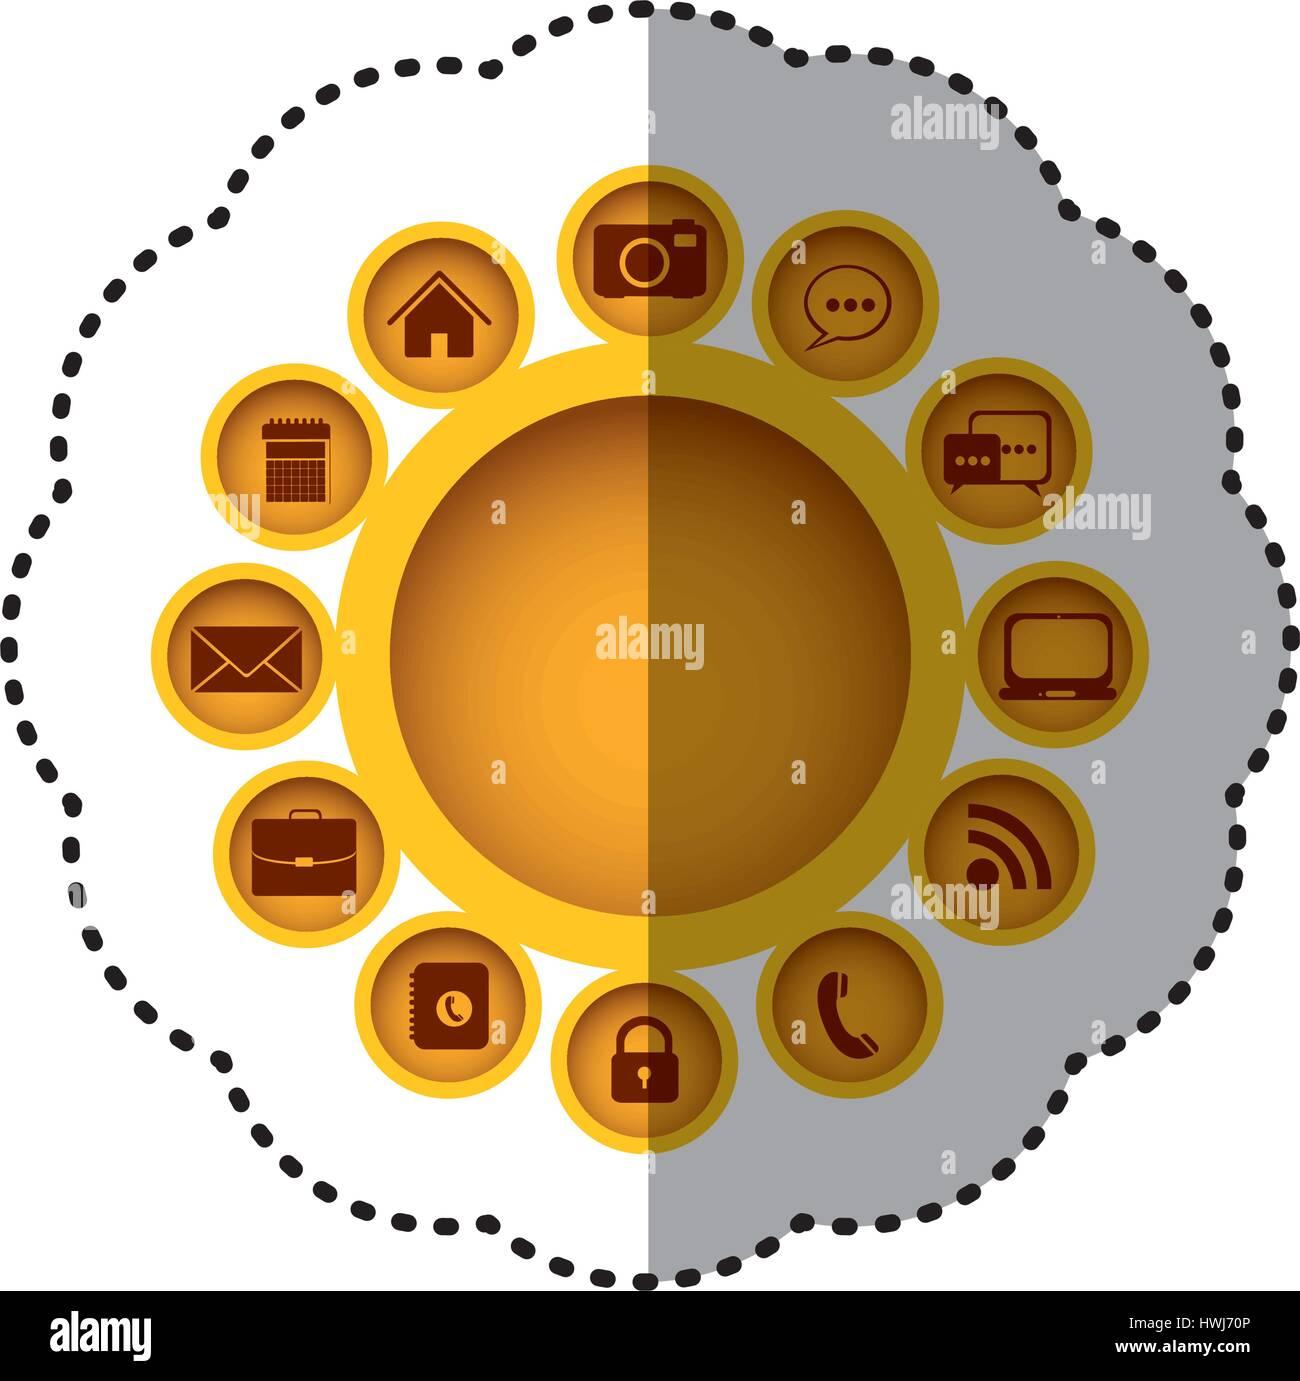 gelb-Technologie-apps-Verbindungen-Symbol Stockbild